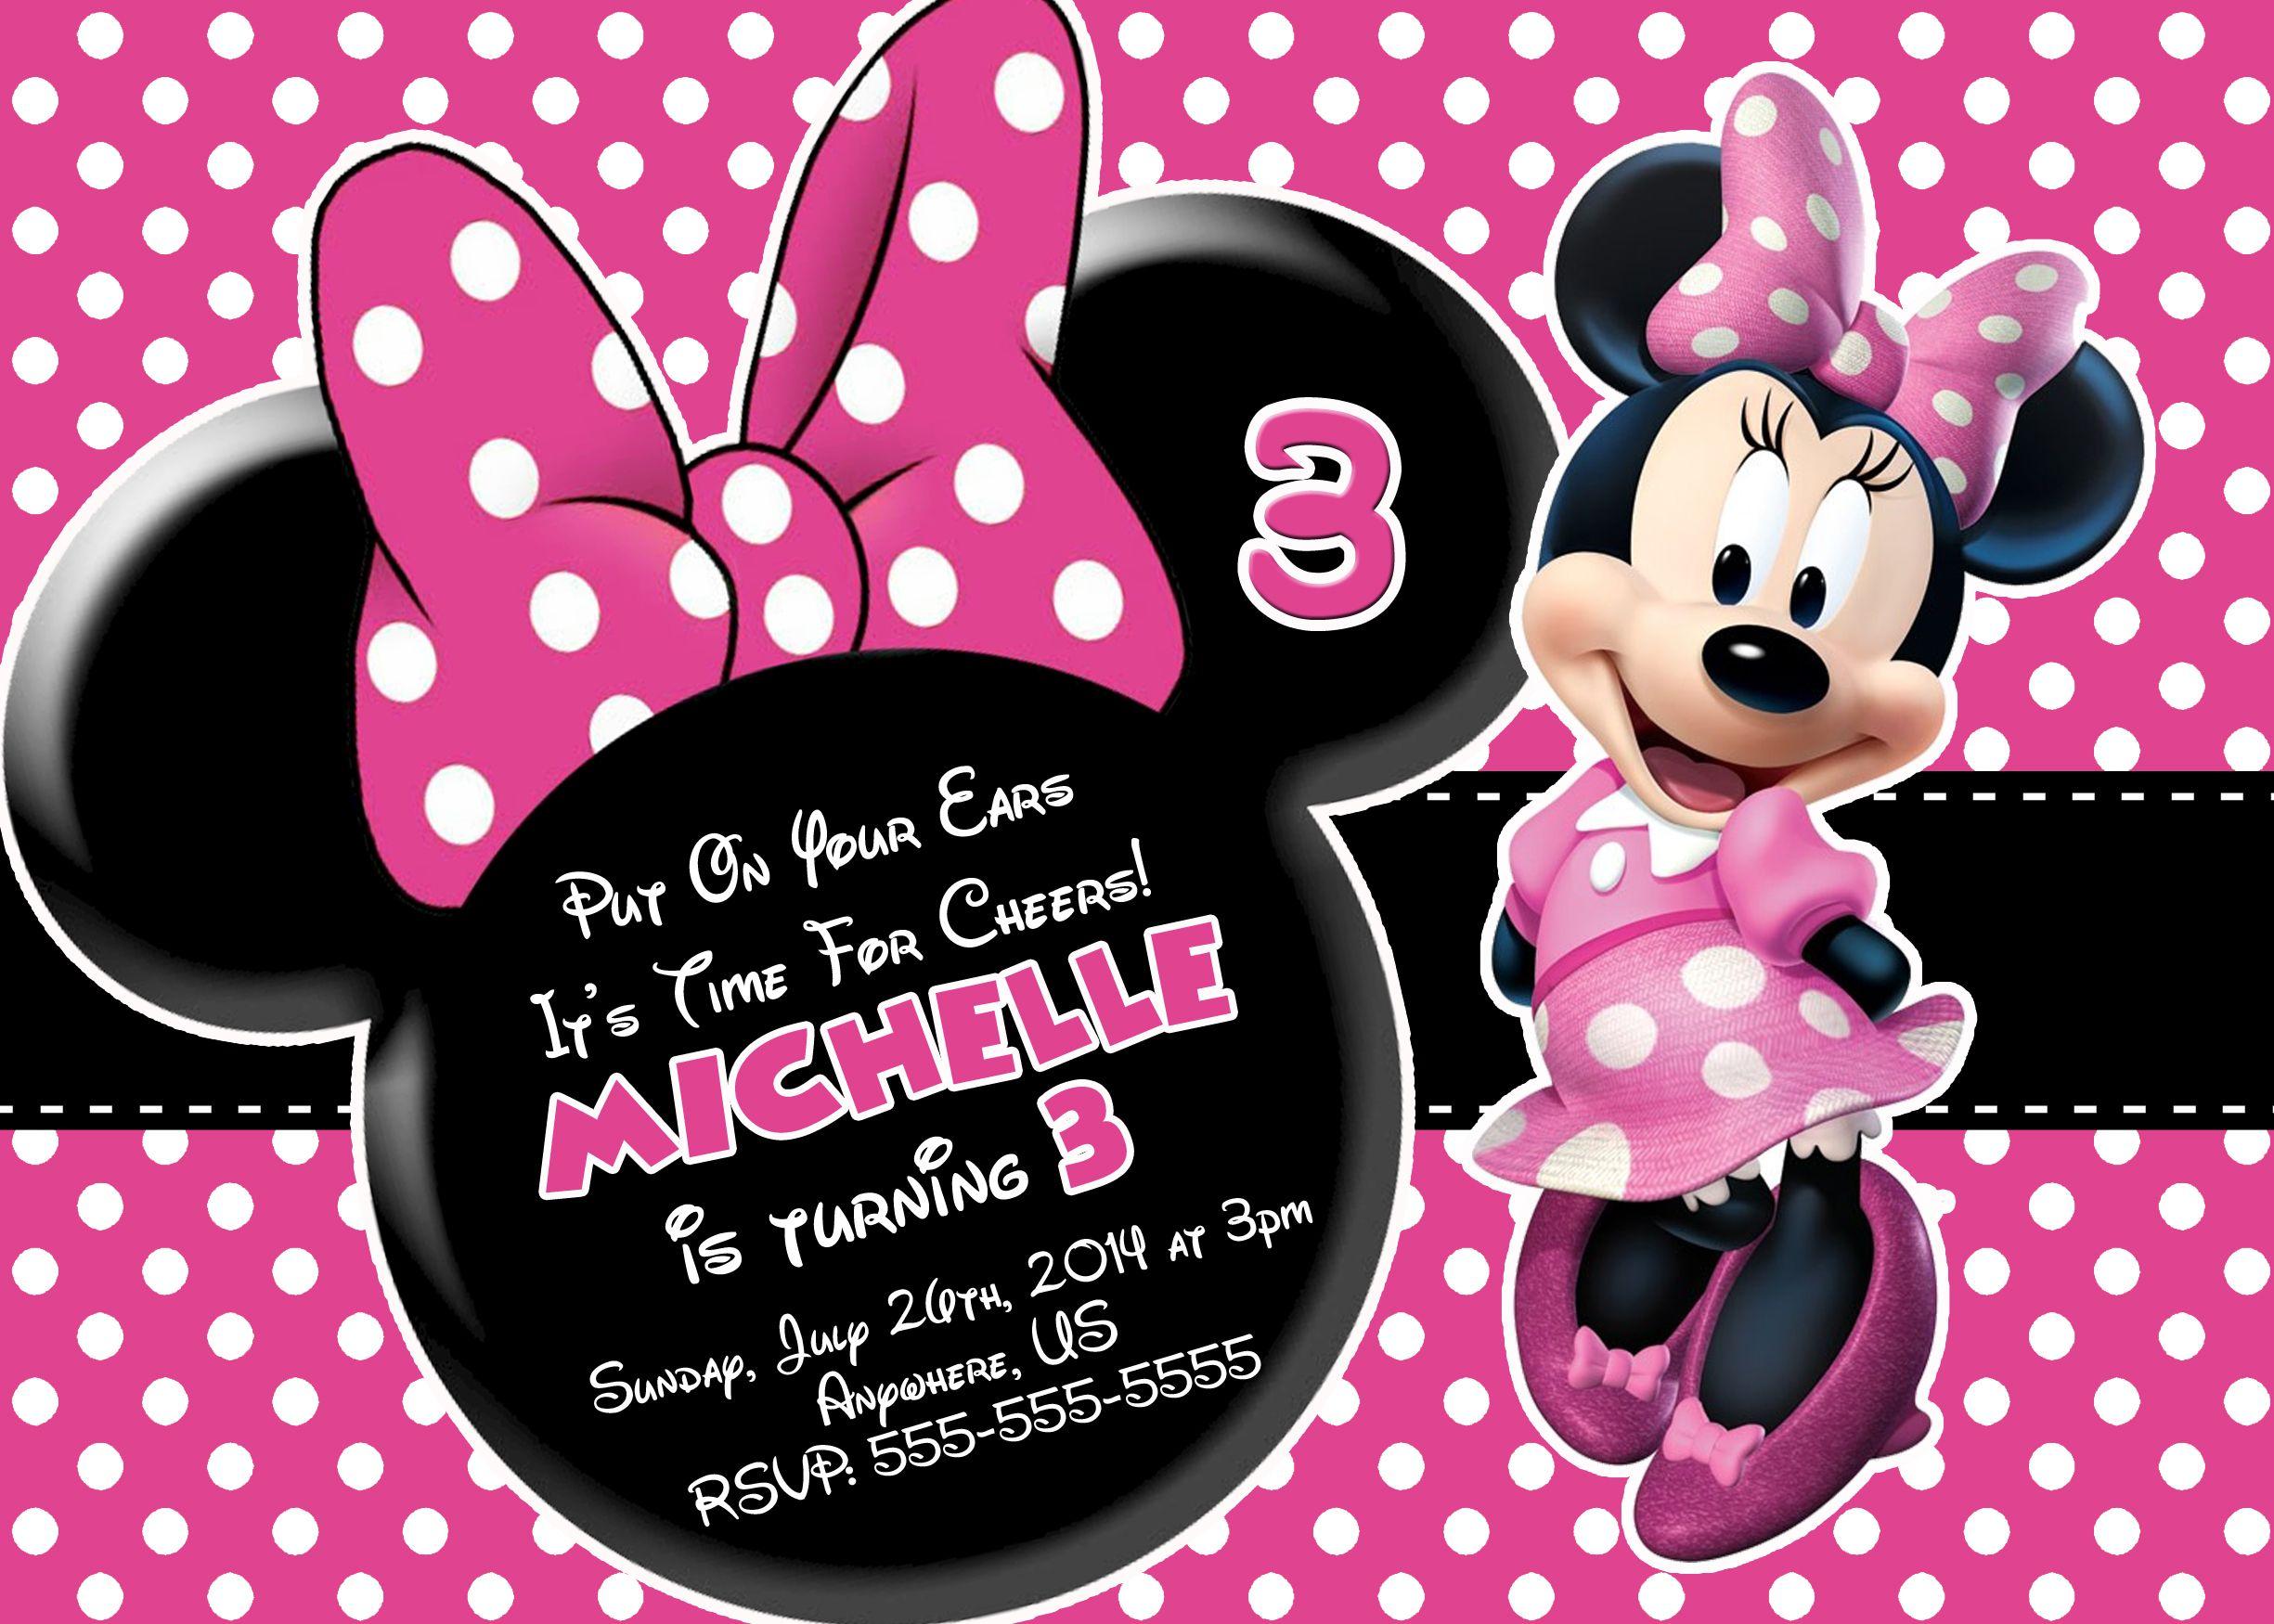 Disney Minnie Mouse Birthday Invitations 899 Available At Partyexpressinvitations